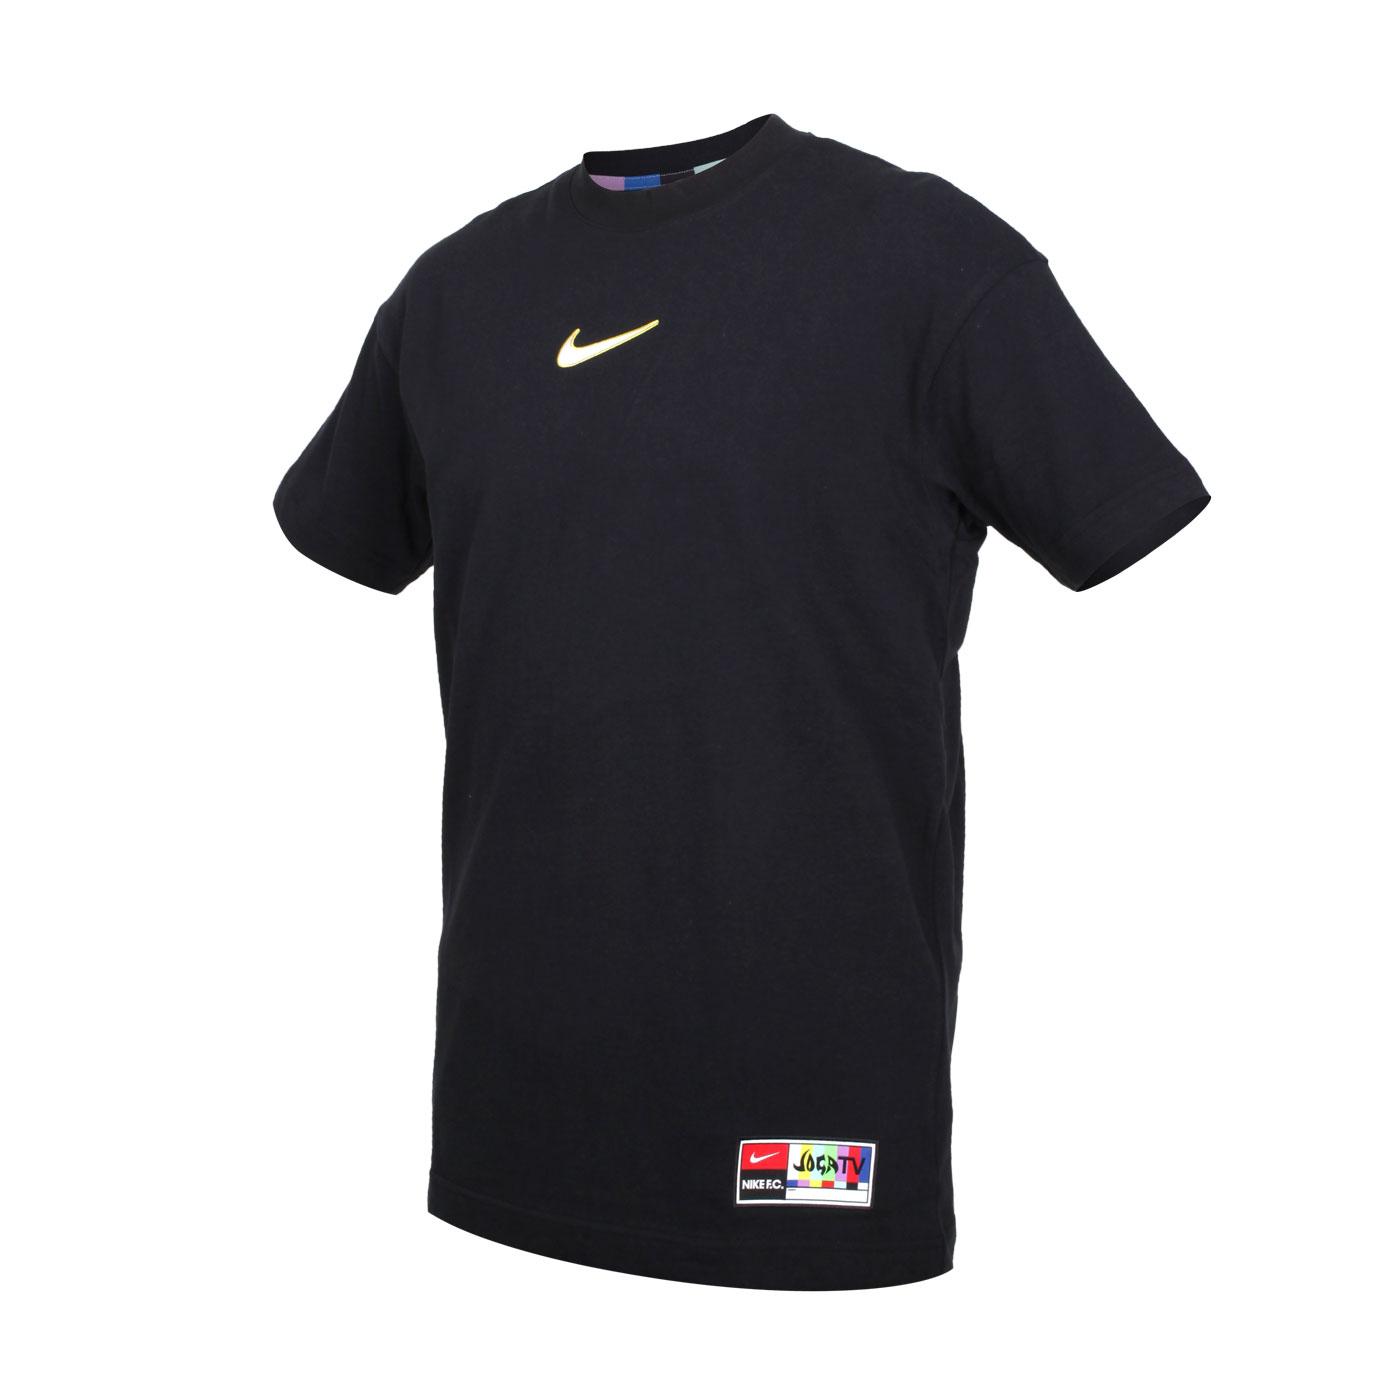 NIKE 男款短袖T恤 CZ1010-010 - 黑白黃